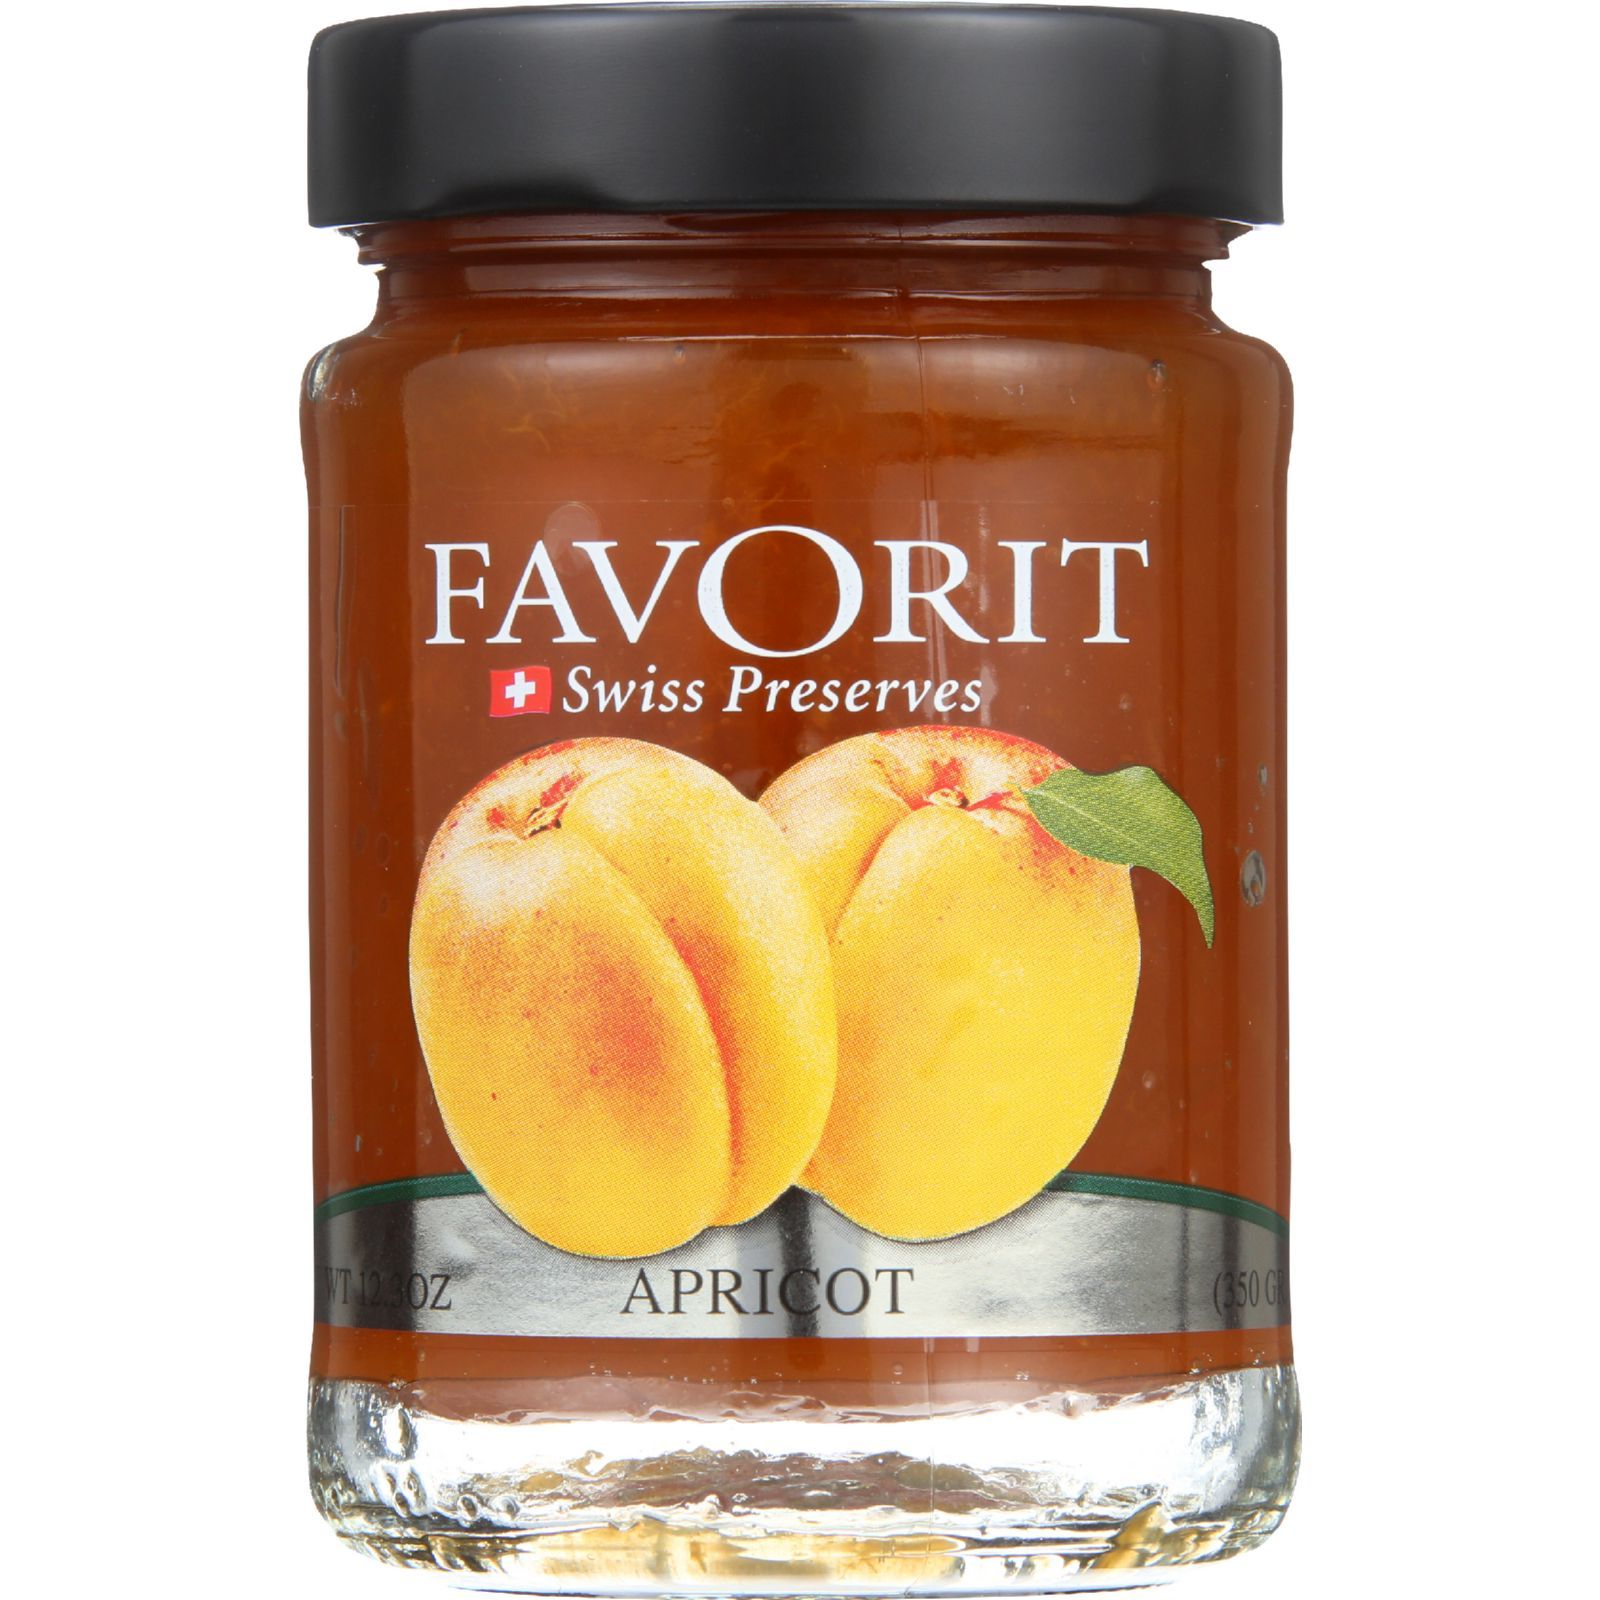 Favorit Preserves - Swiss - Apricot - 12.3 oz - case of 6